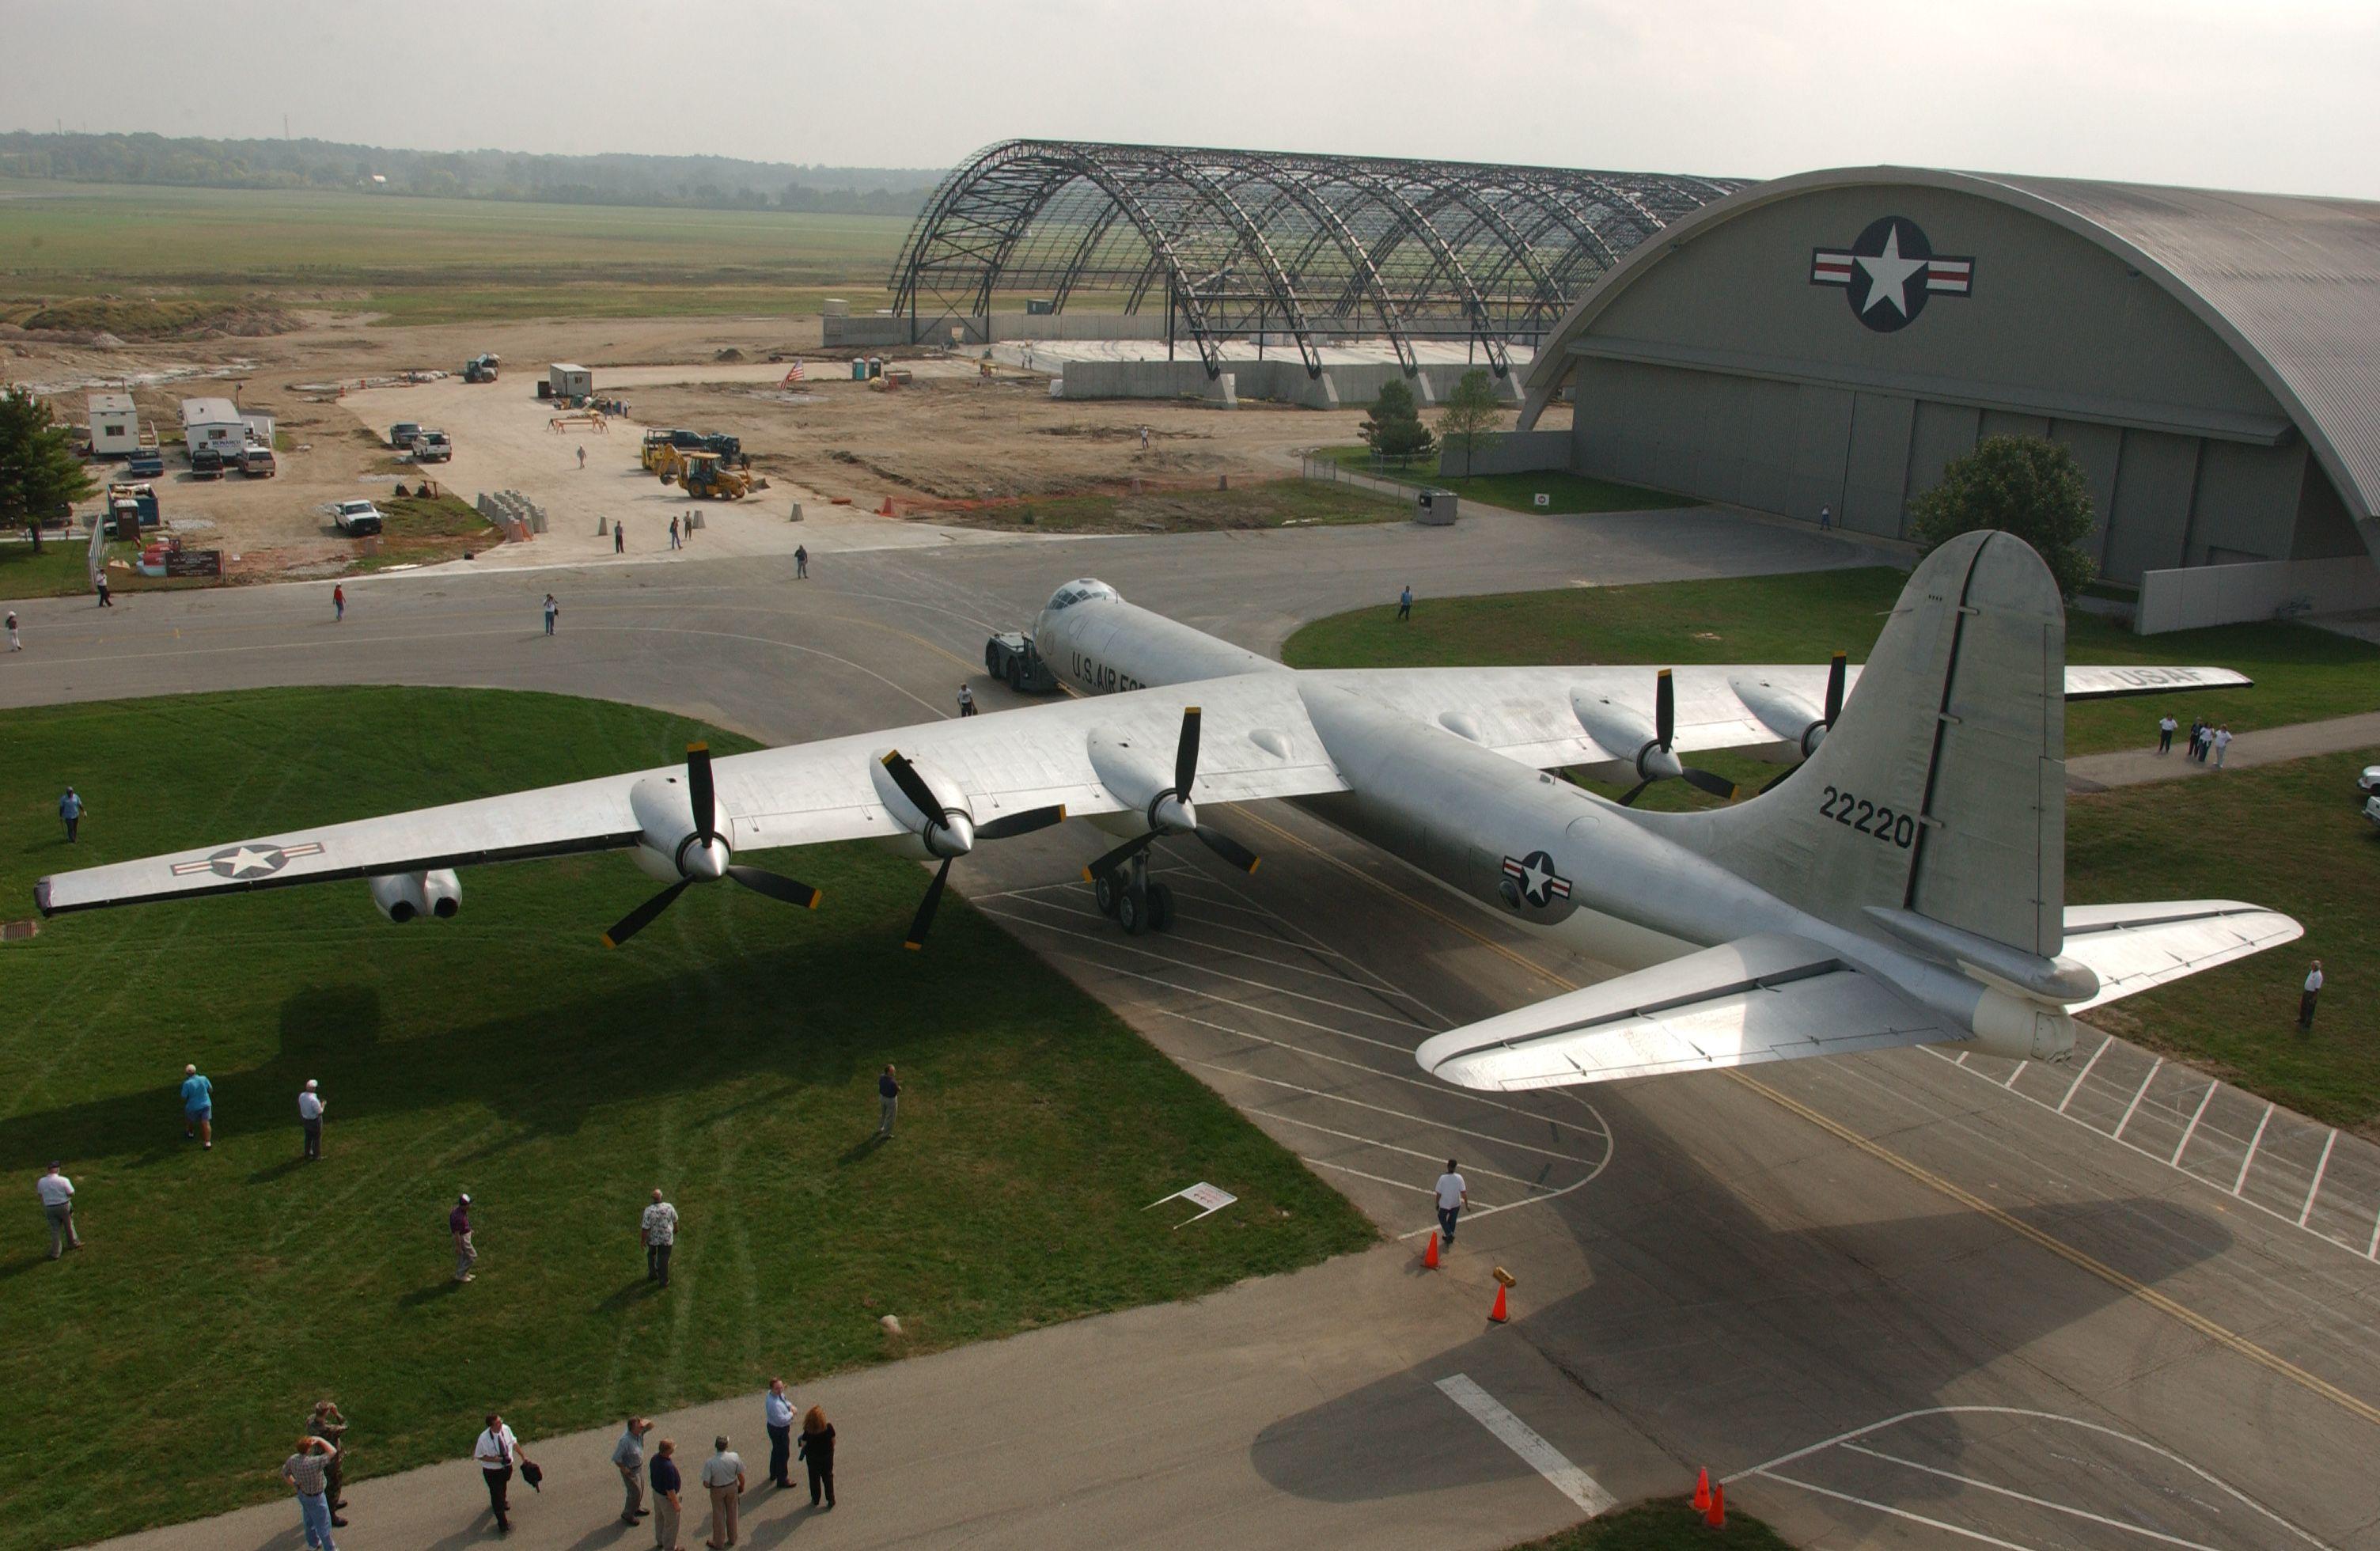 Convair B36 Peacemaker (google.image) 04.20 2/2 in 2020